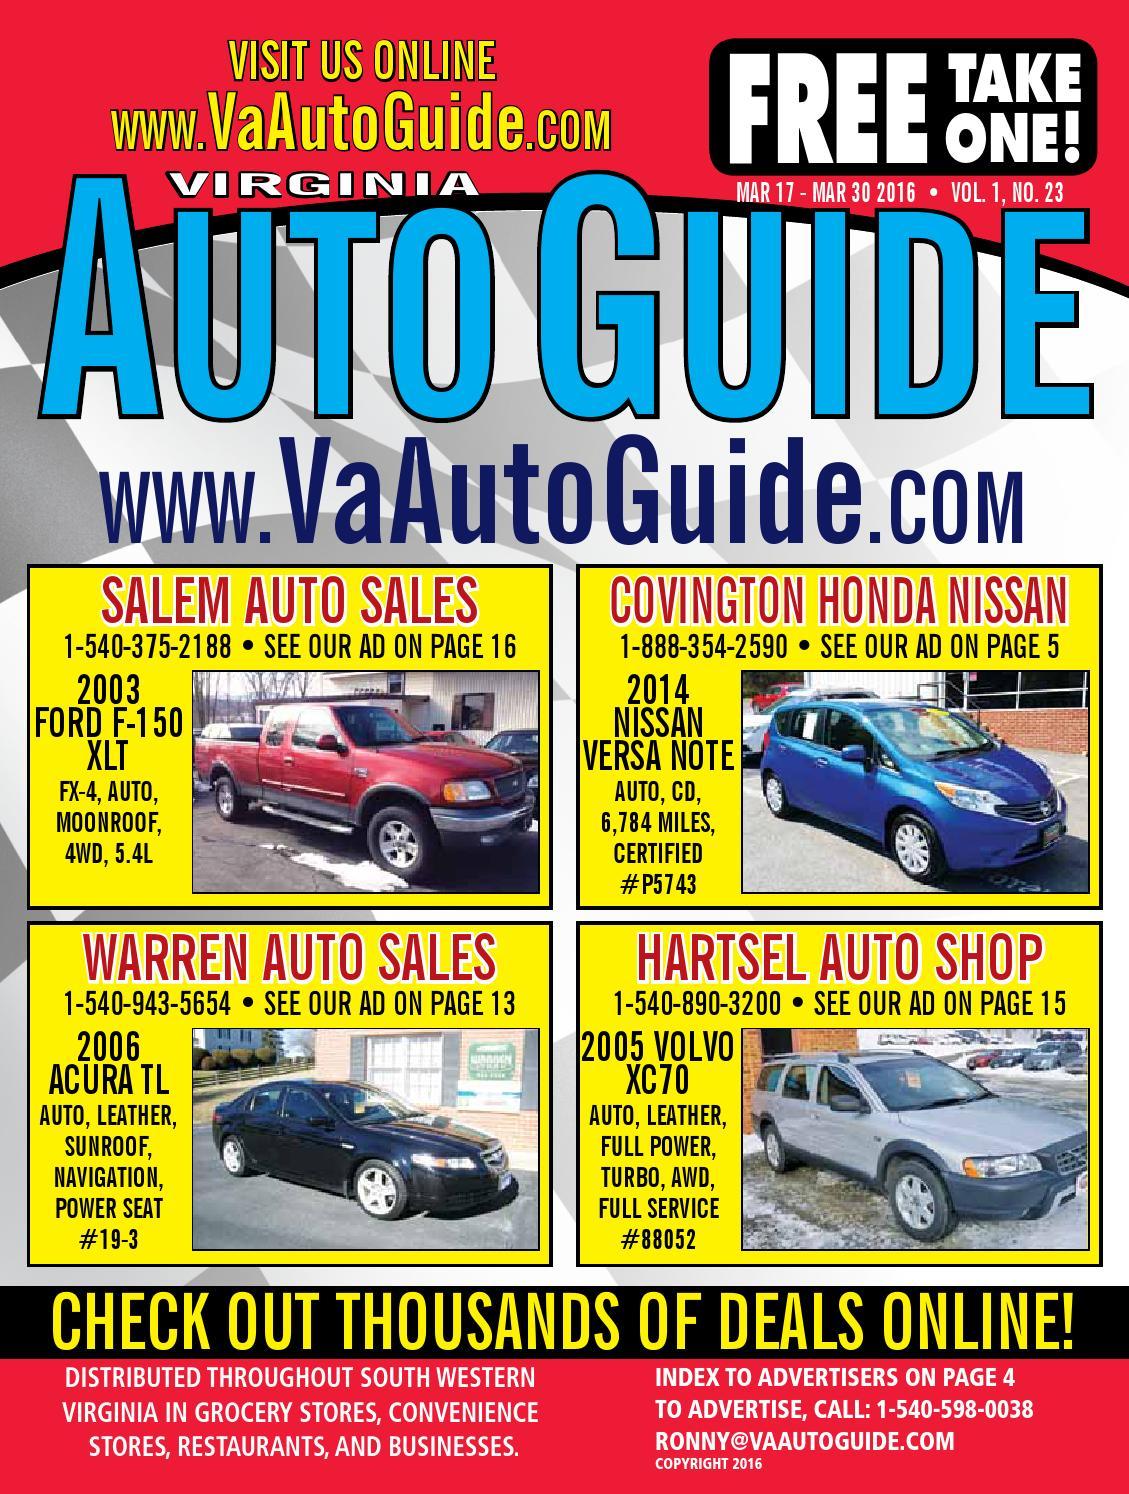 Covington Honda Nissan >> Va Auto Guide 01 23 Webres By Va Auto Guide Issuu